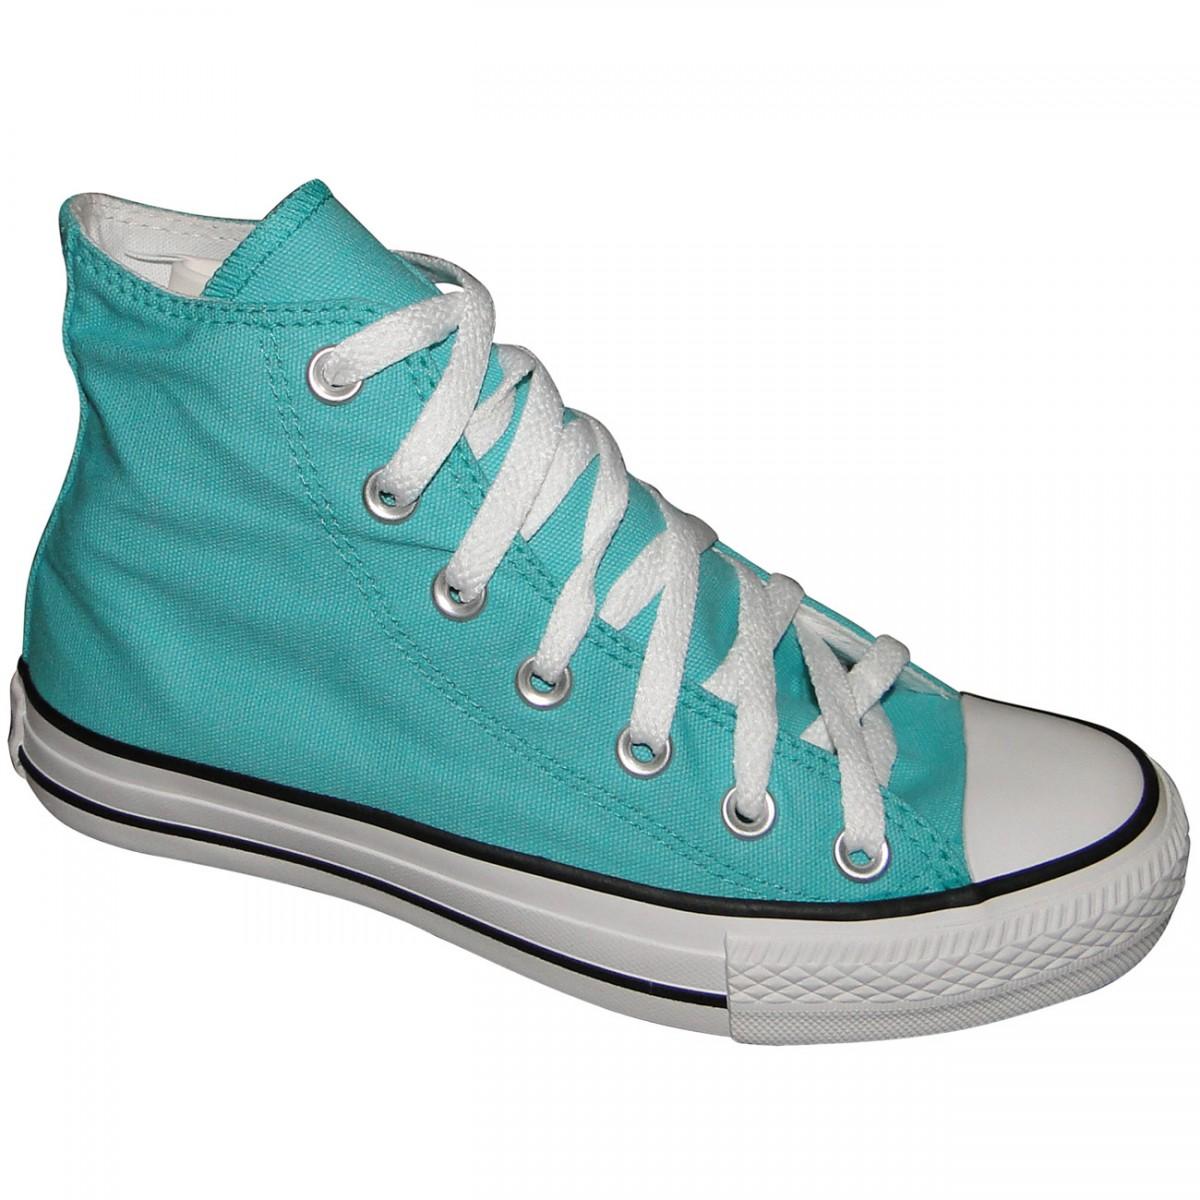 845bfb254e BOTA ALL STAR CONVERSE CORE HI CT112067 - PISCINA BRANCO - Chuteira Nike